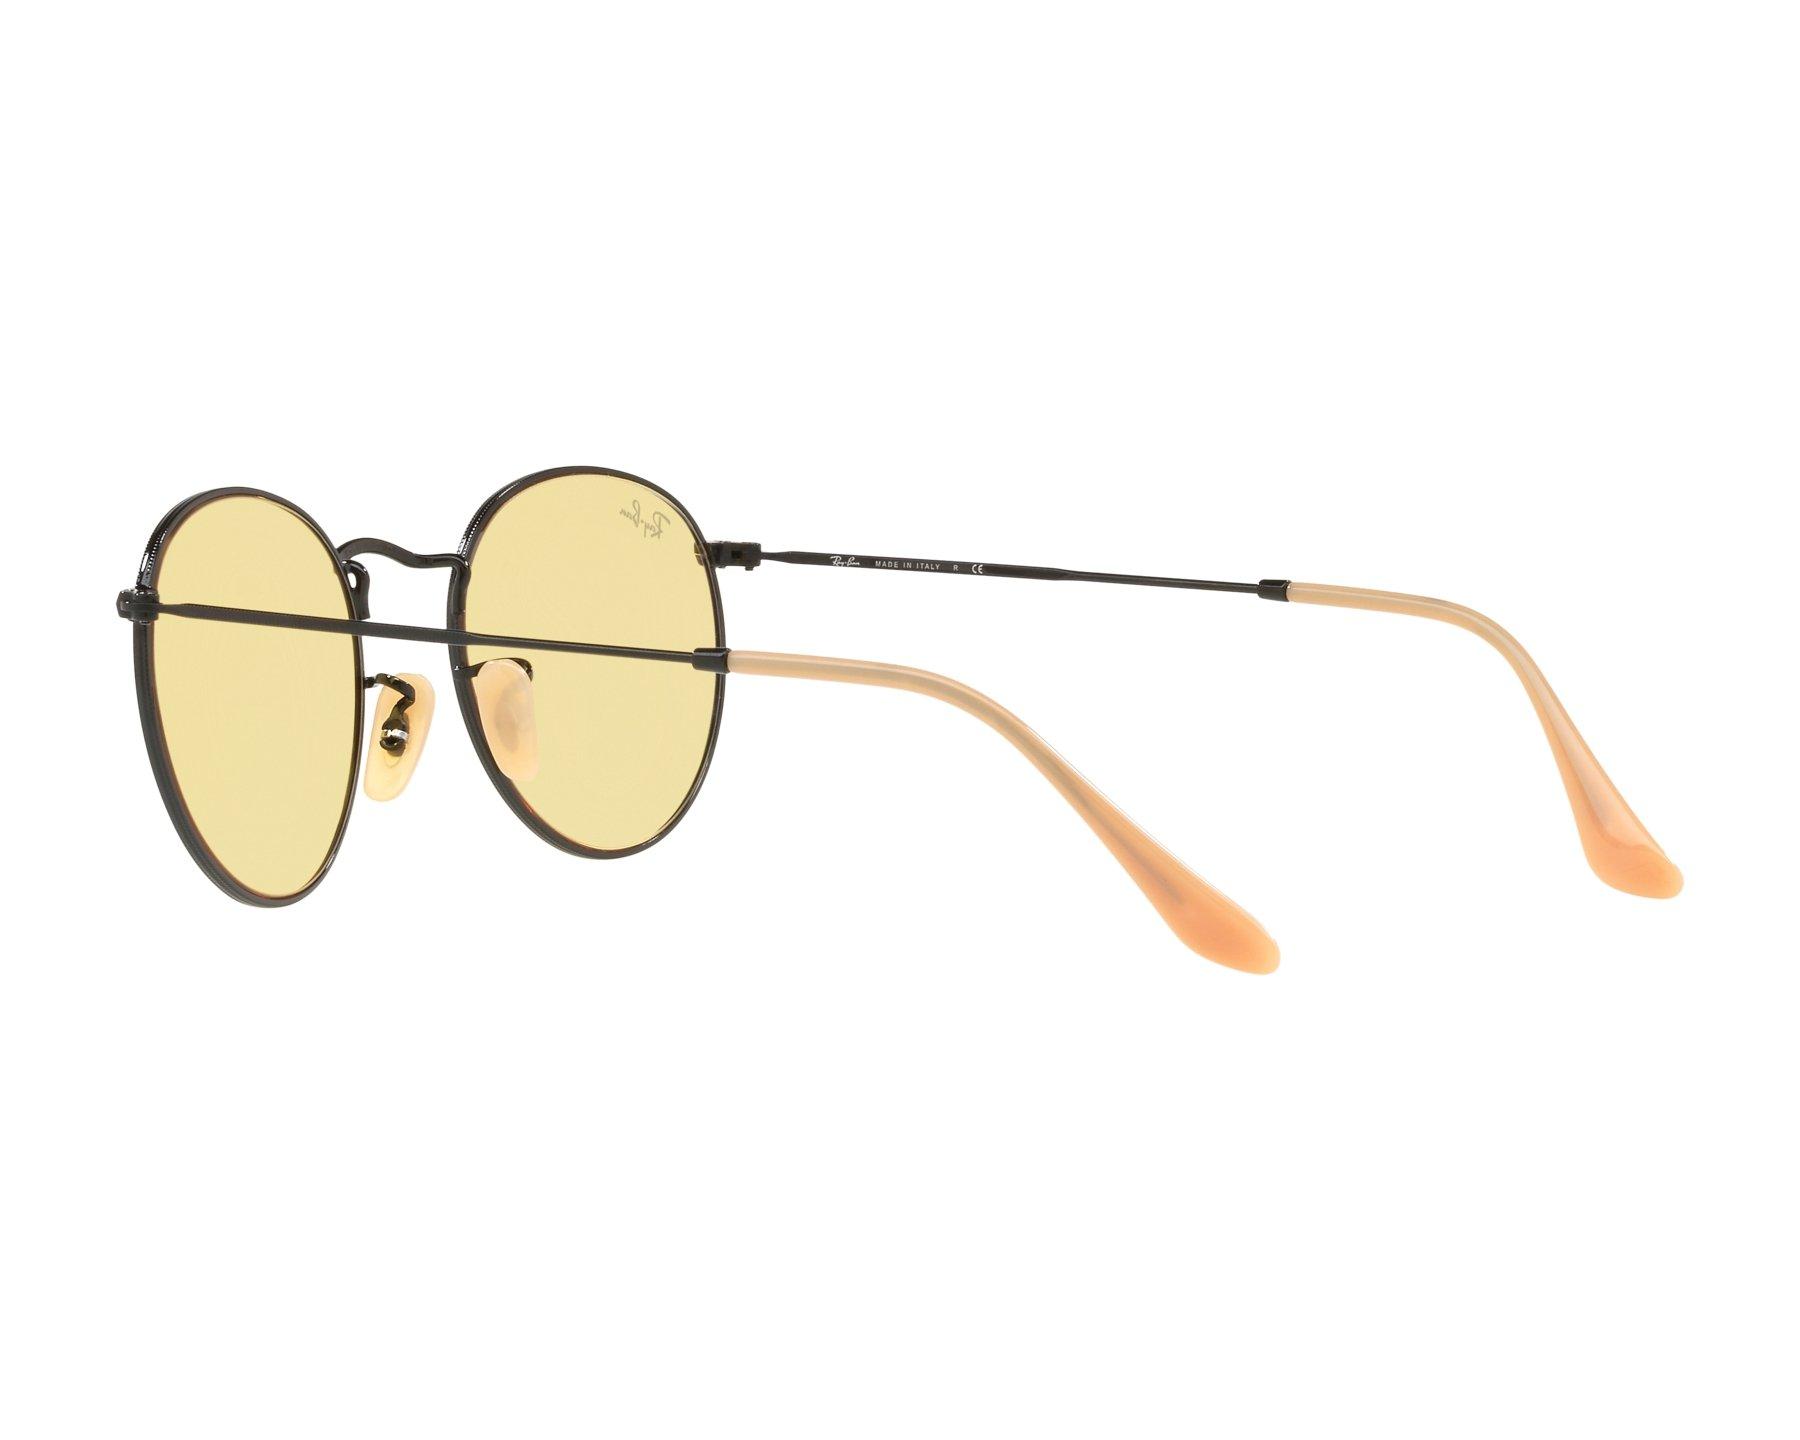 52dc3a52f48 ... Sunglasses Ray-Ban RB-3447 90664A 50-21 Black 360 degree view 5 ...